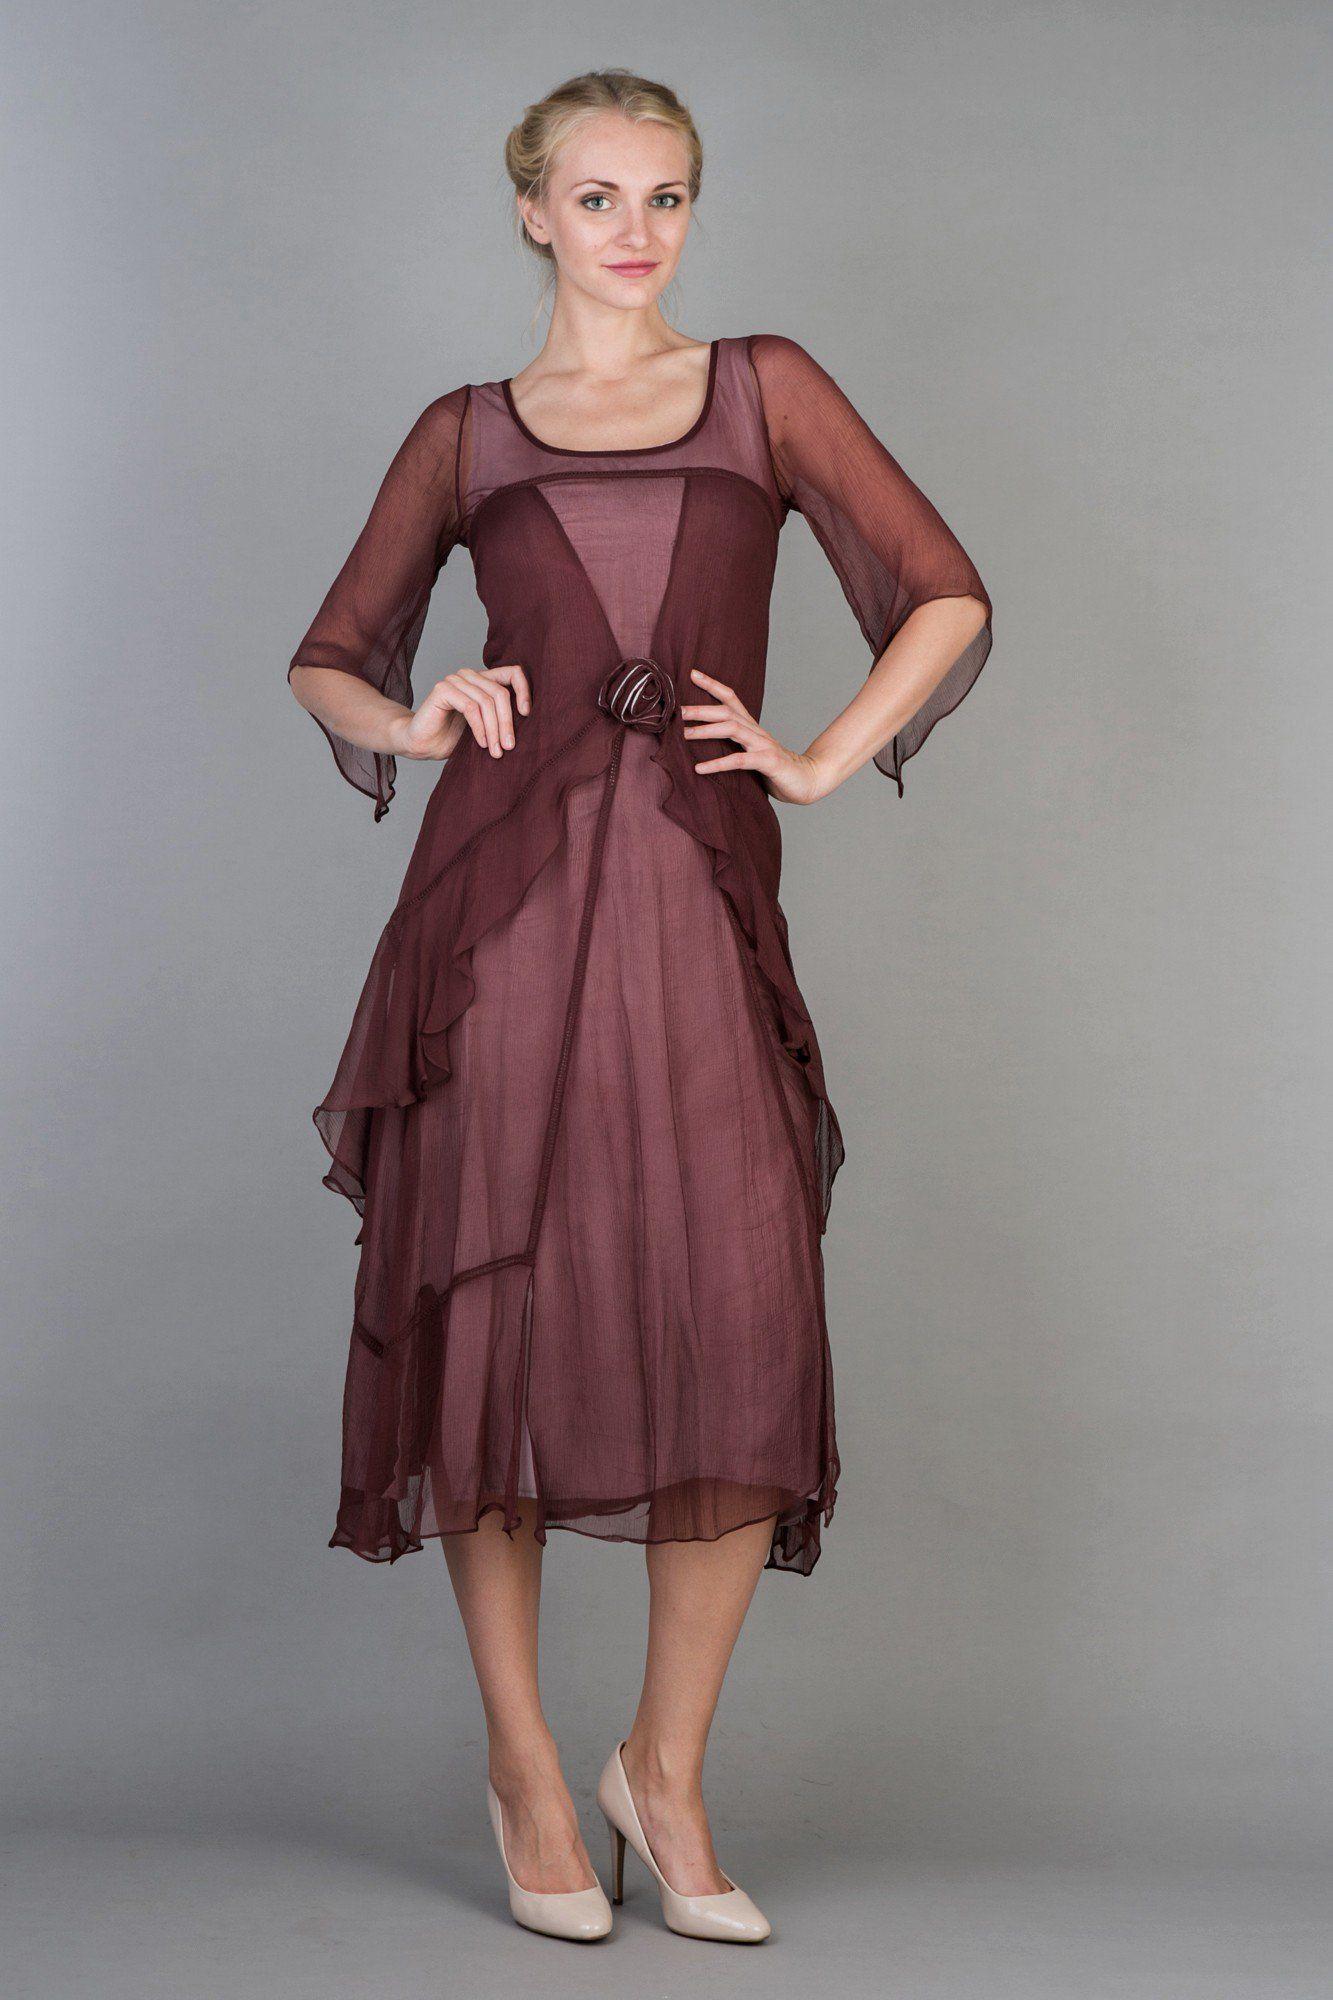 1930s Evening Dress, Art Deco Gown, Party Dress Cocktail